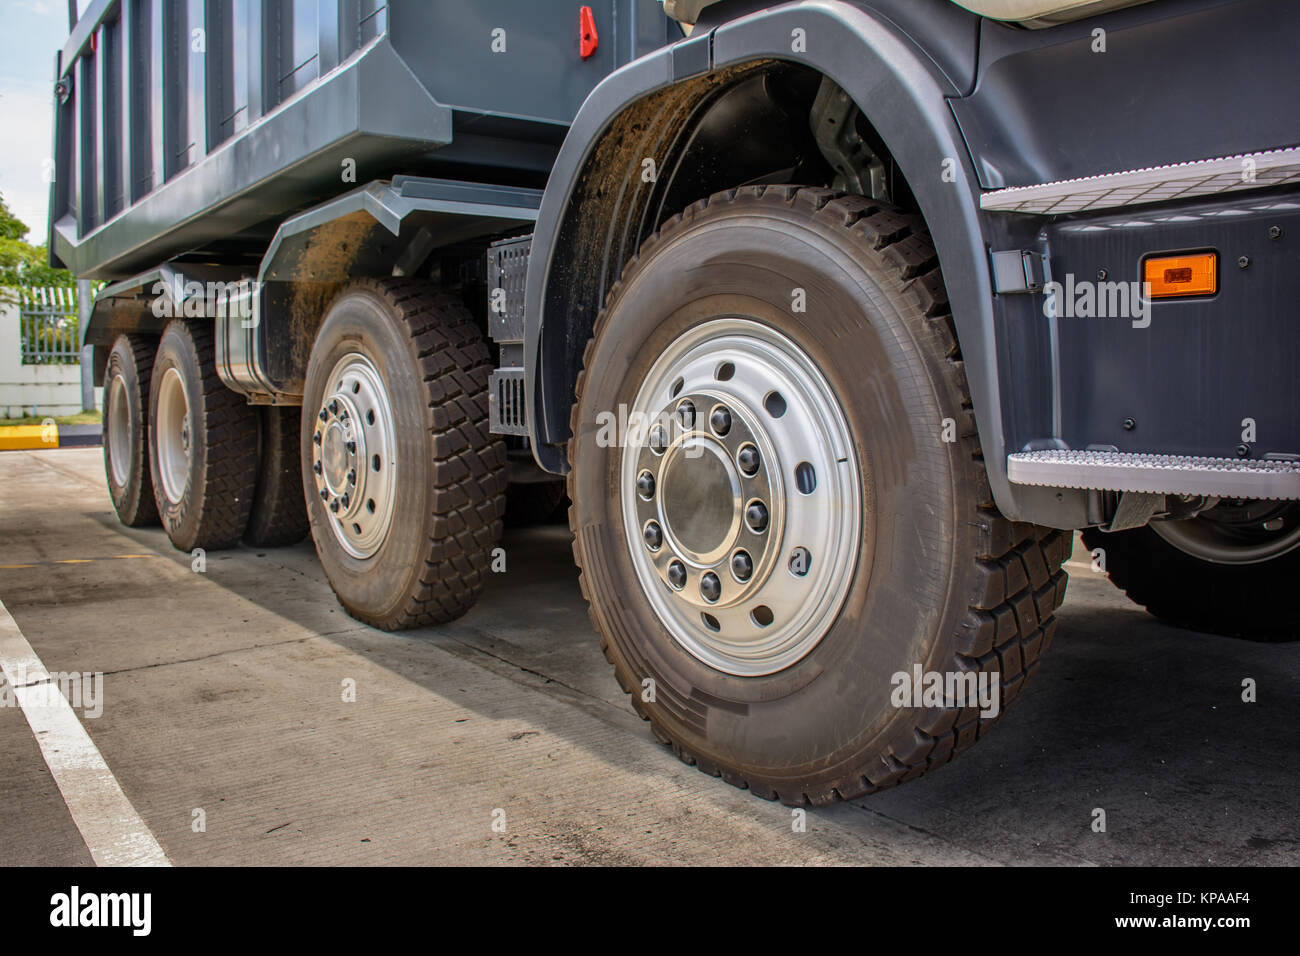 wheels of brand new dumb trucks - Stock Image